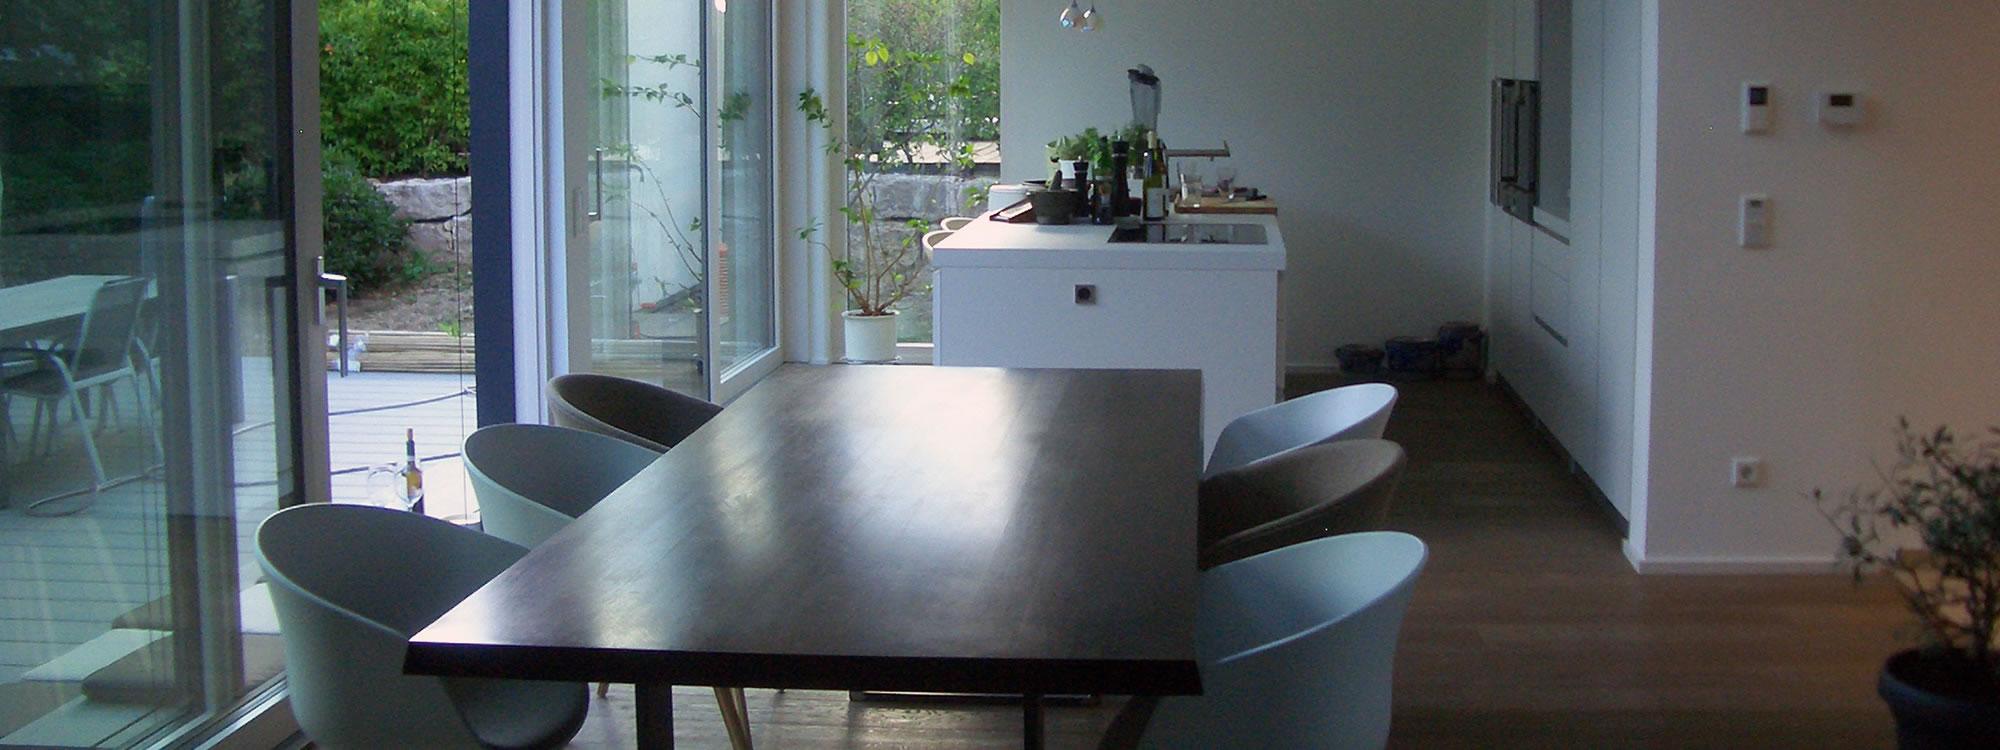 baufamilienportr t familie steinbacher im interview. Black Bedroom Furniture Sets. Home Design Ideas